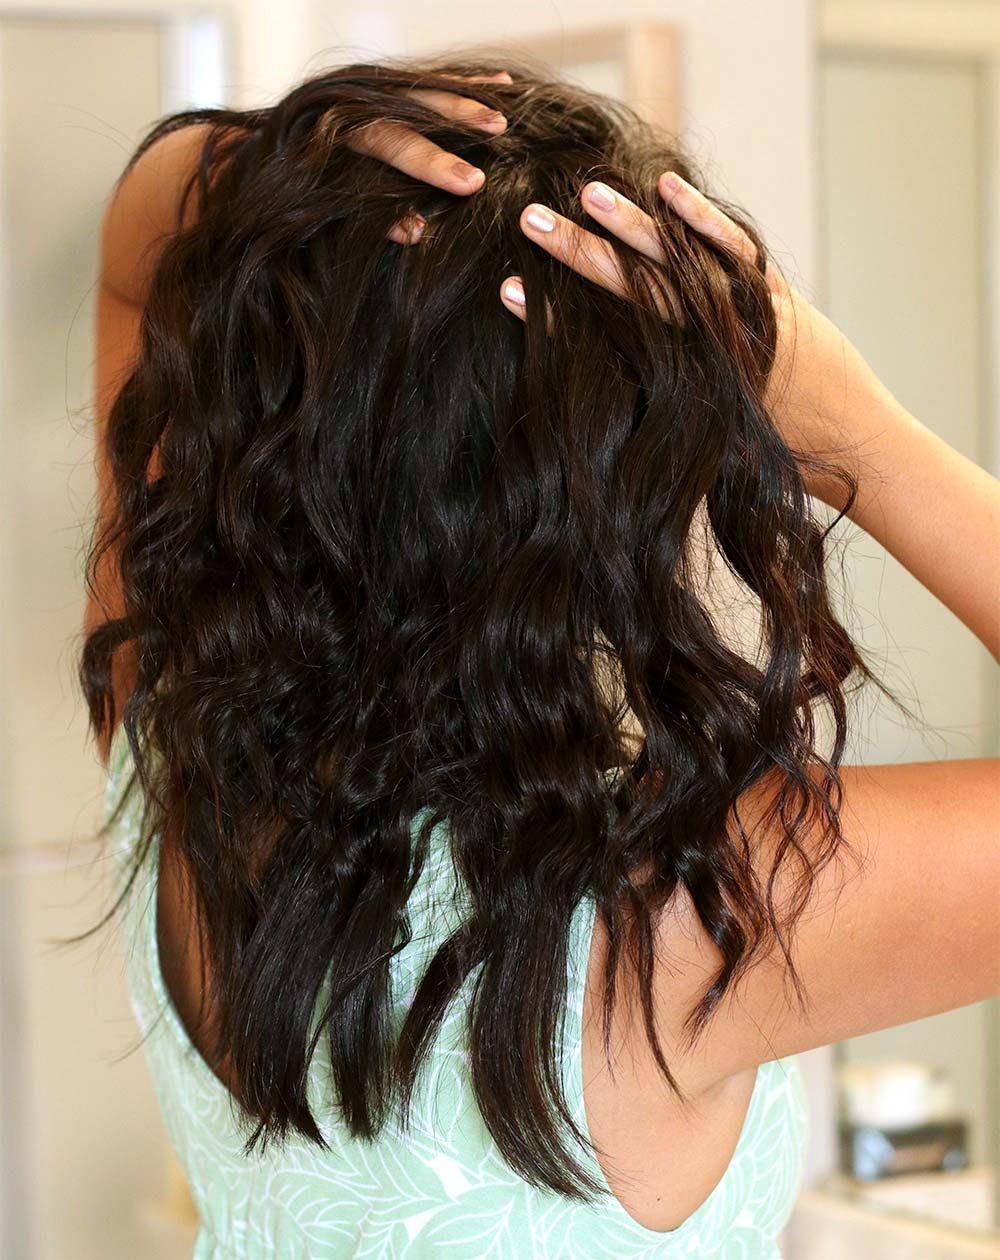 oribe summer hair braids undone 2